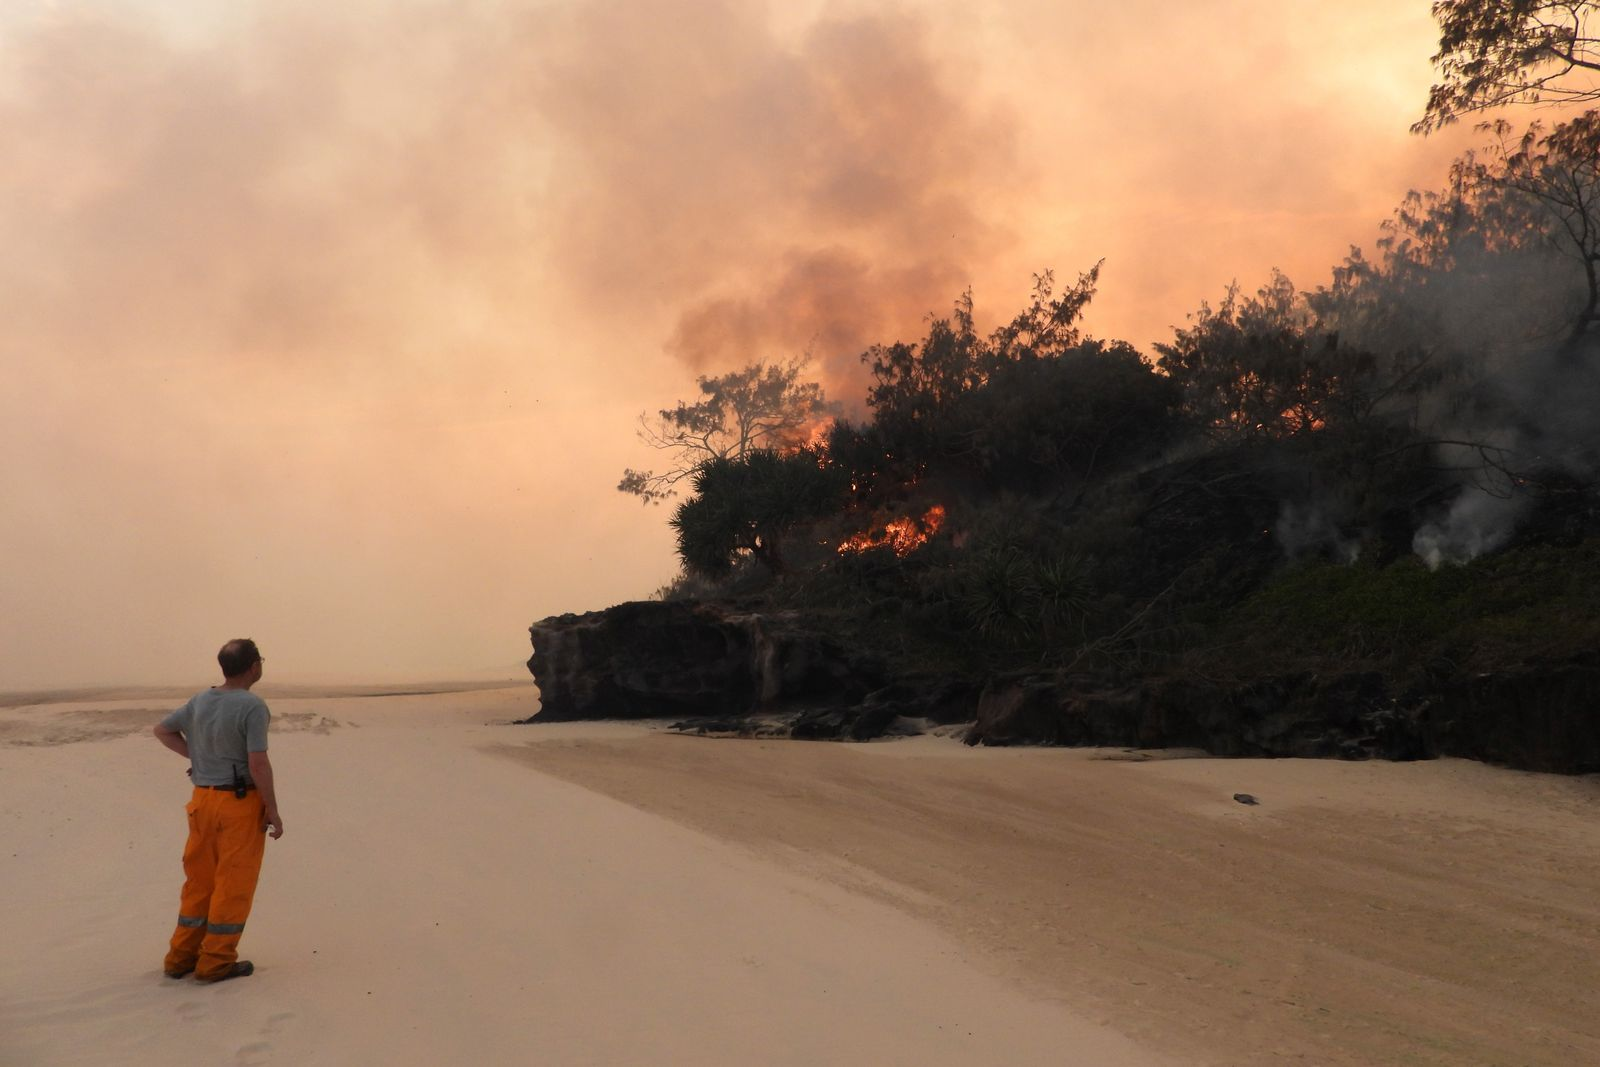 Bushfire Continues To Burn On Fraser Island